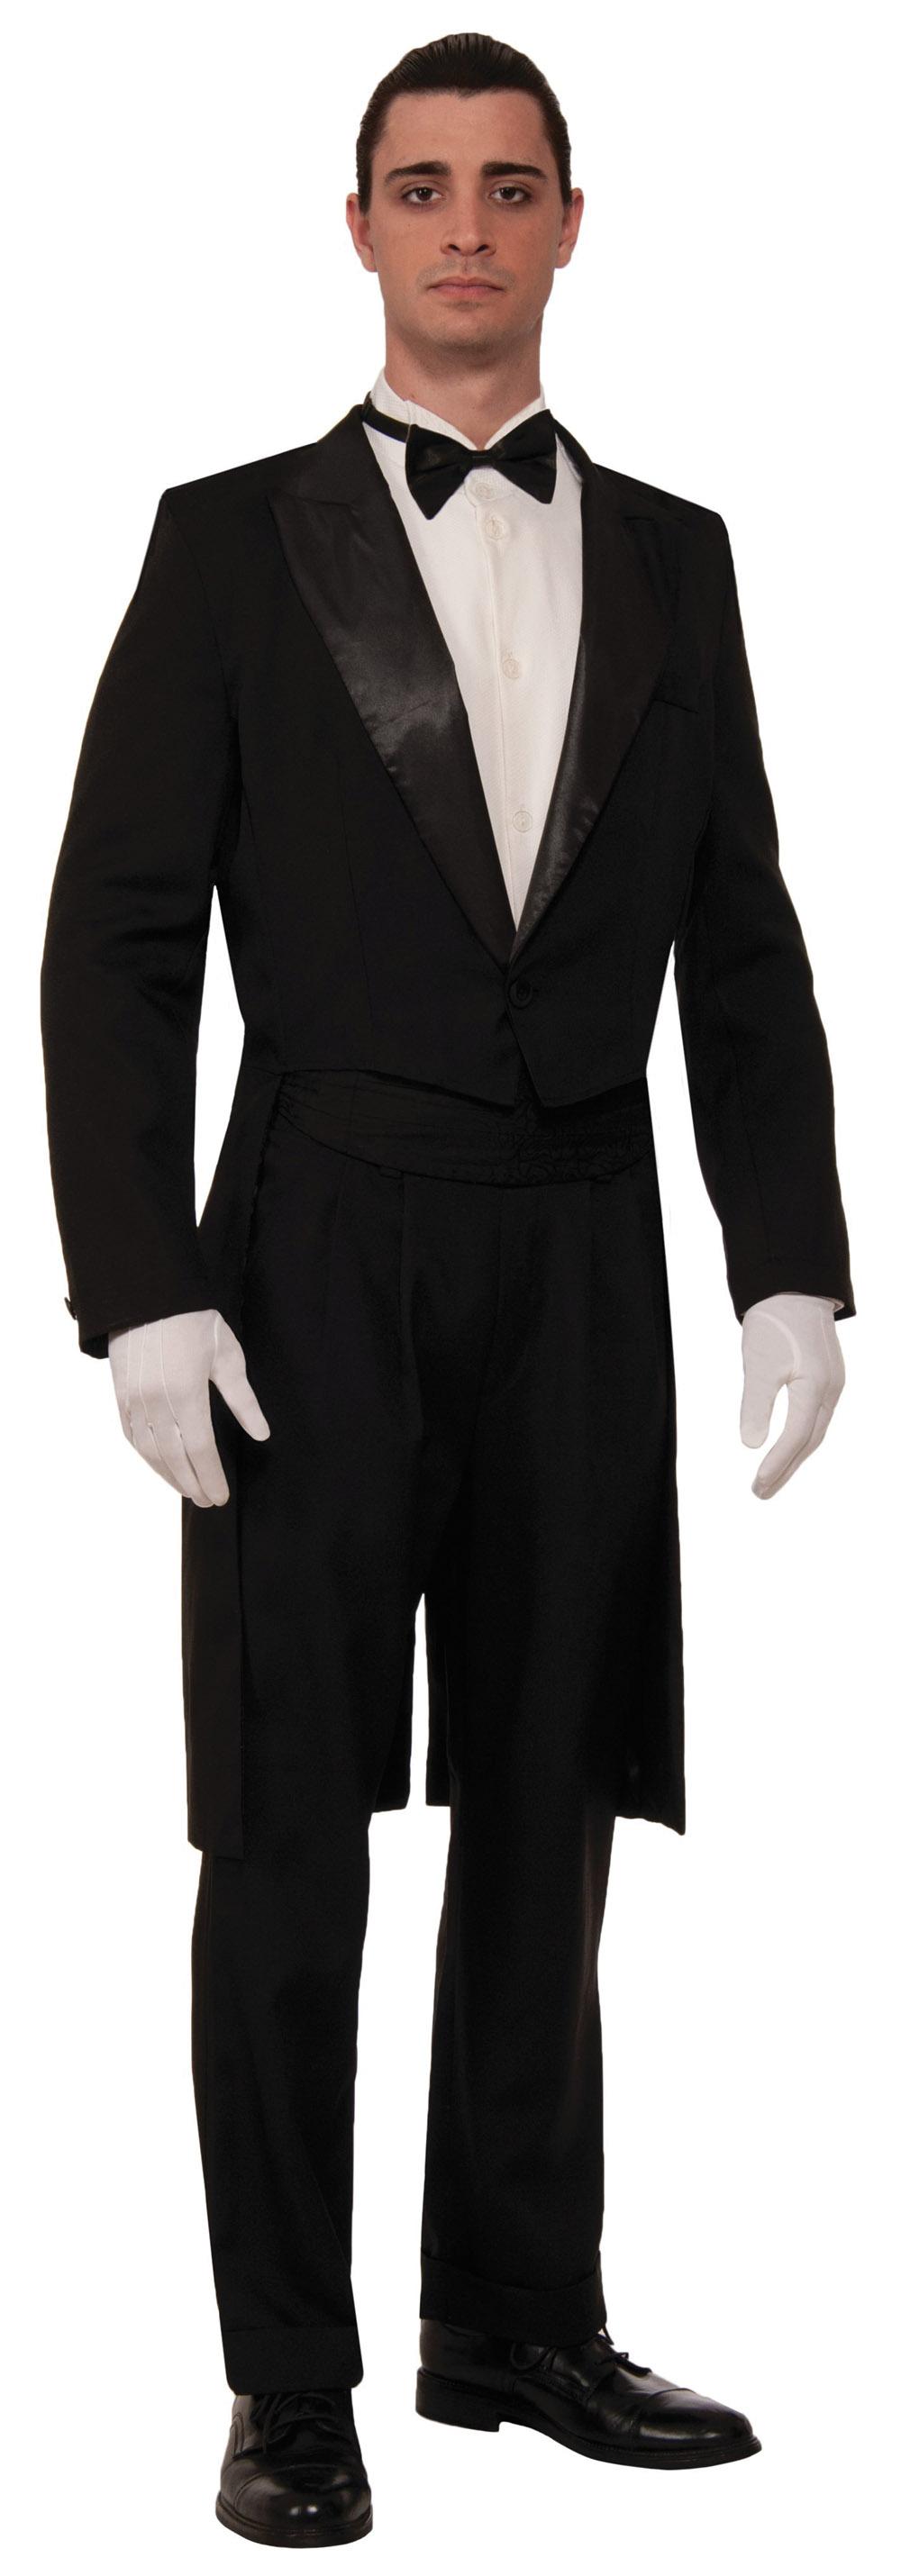 Adult Tuxedo Costume Thumbnail 1